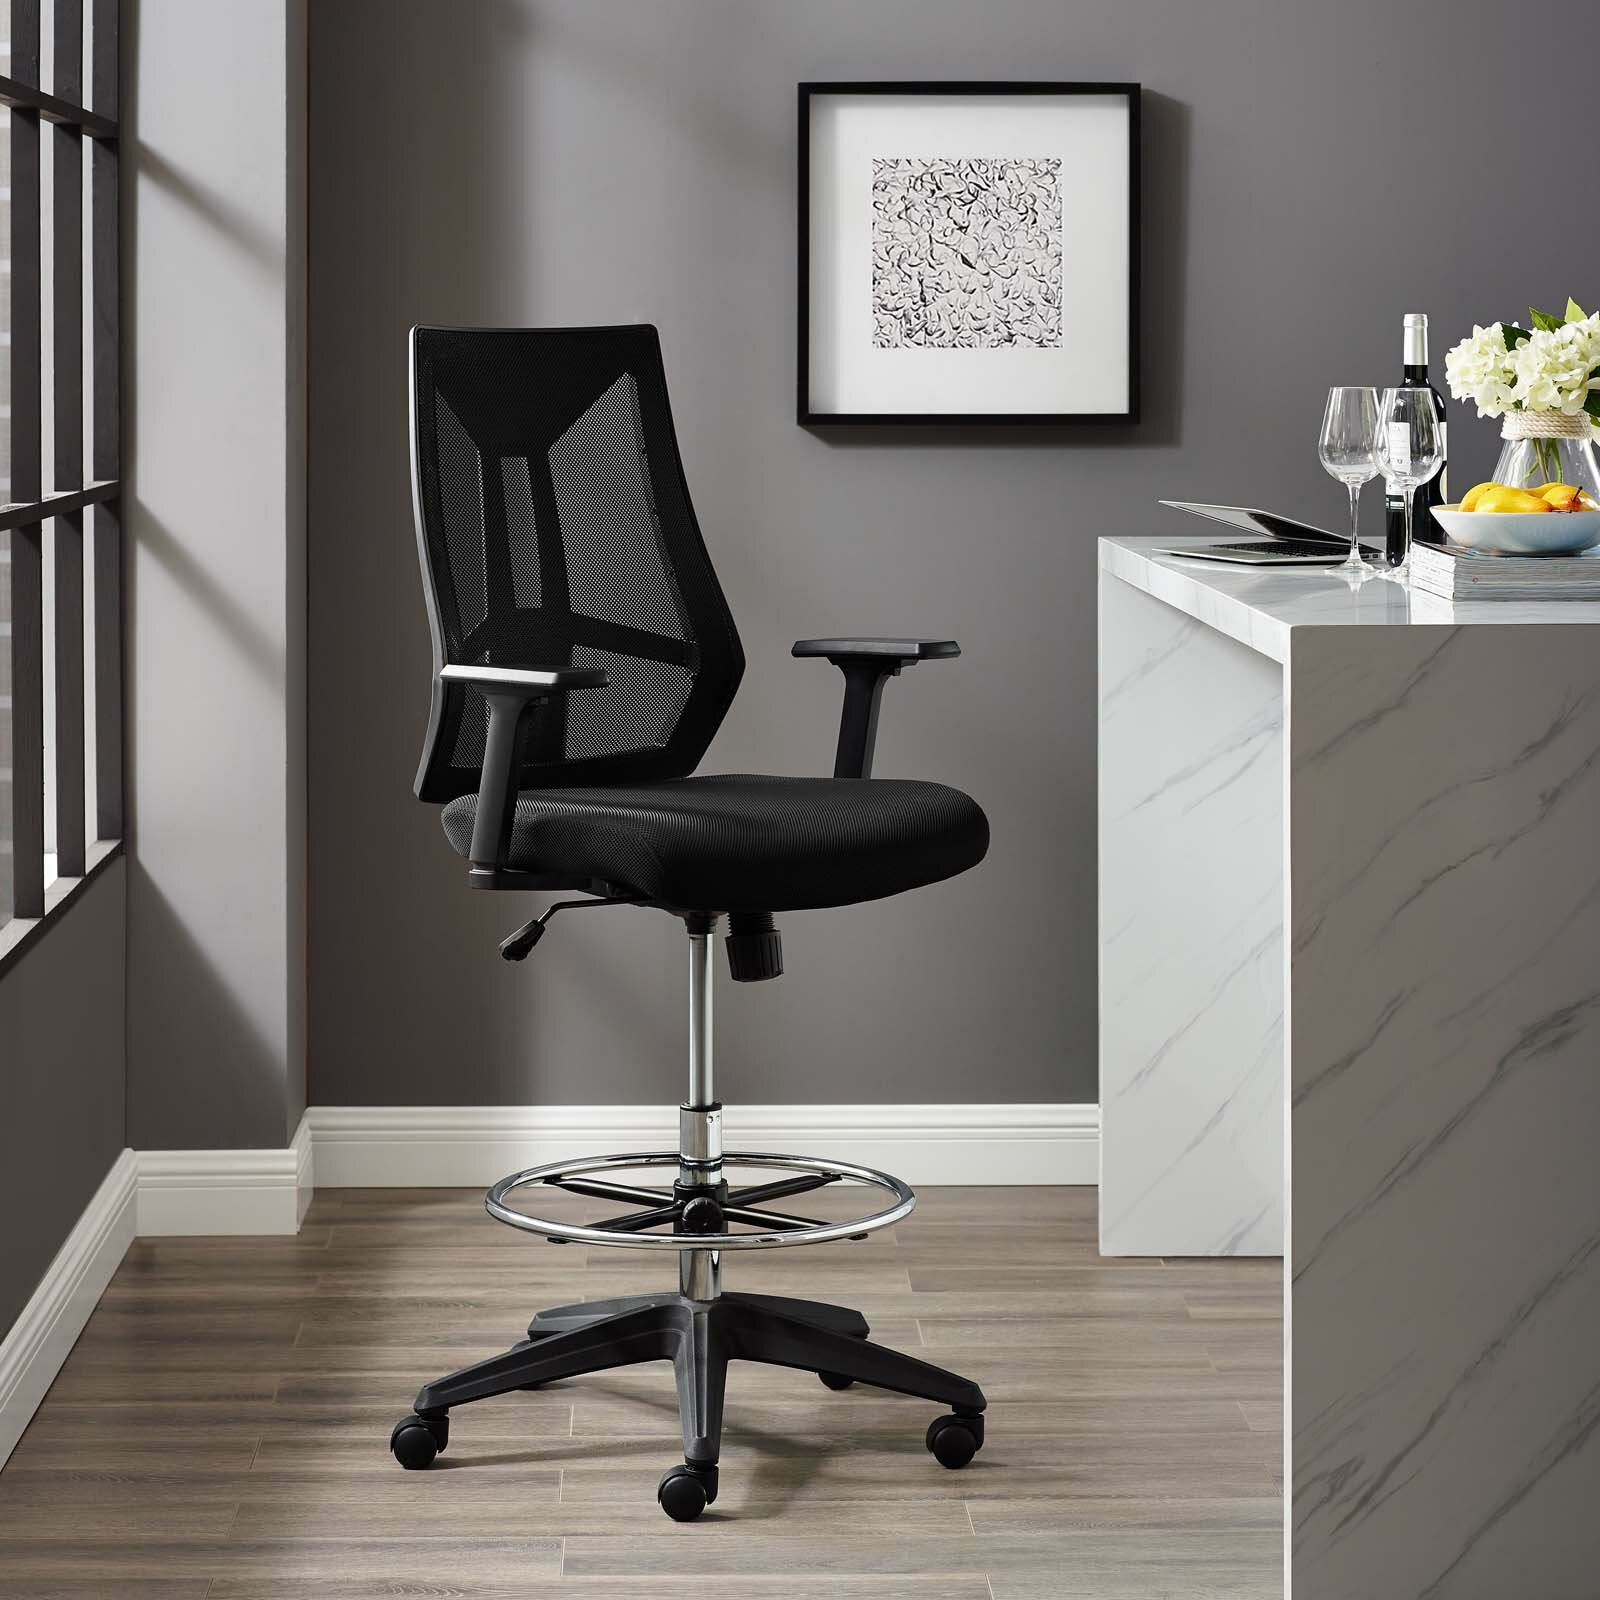 Sensational Citronelle Ergonomic Mesh Drafting Chair Home Interior And Landscaping Ponolsignezvosmurscom